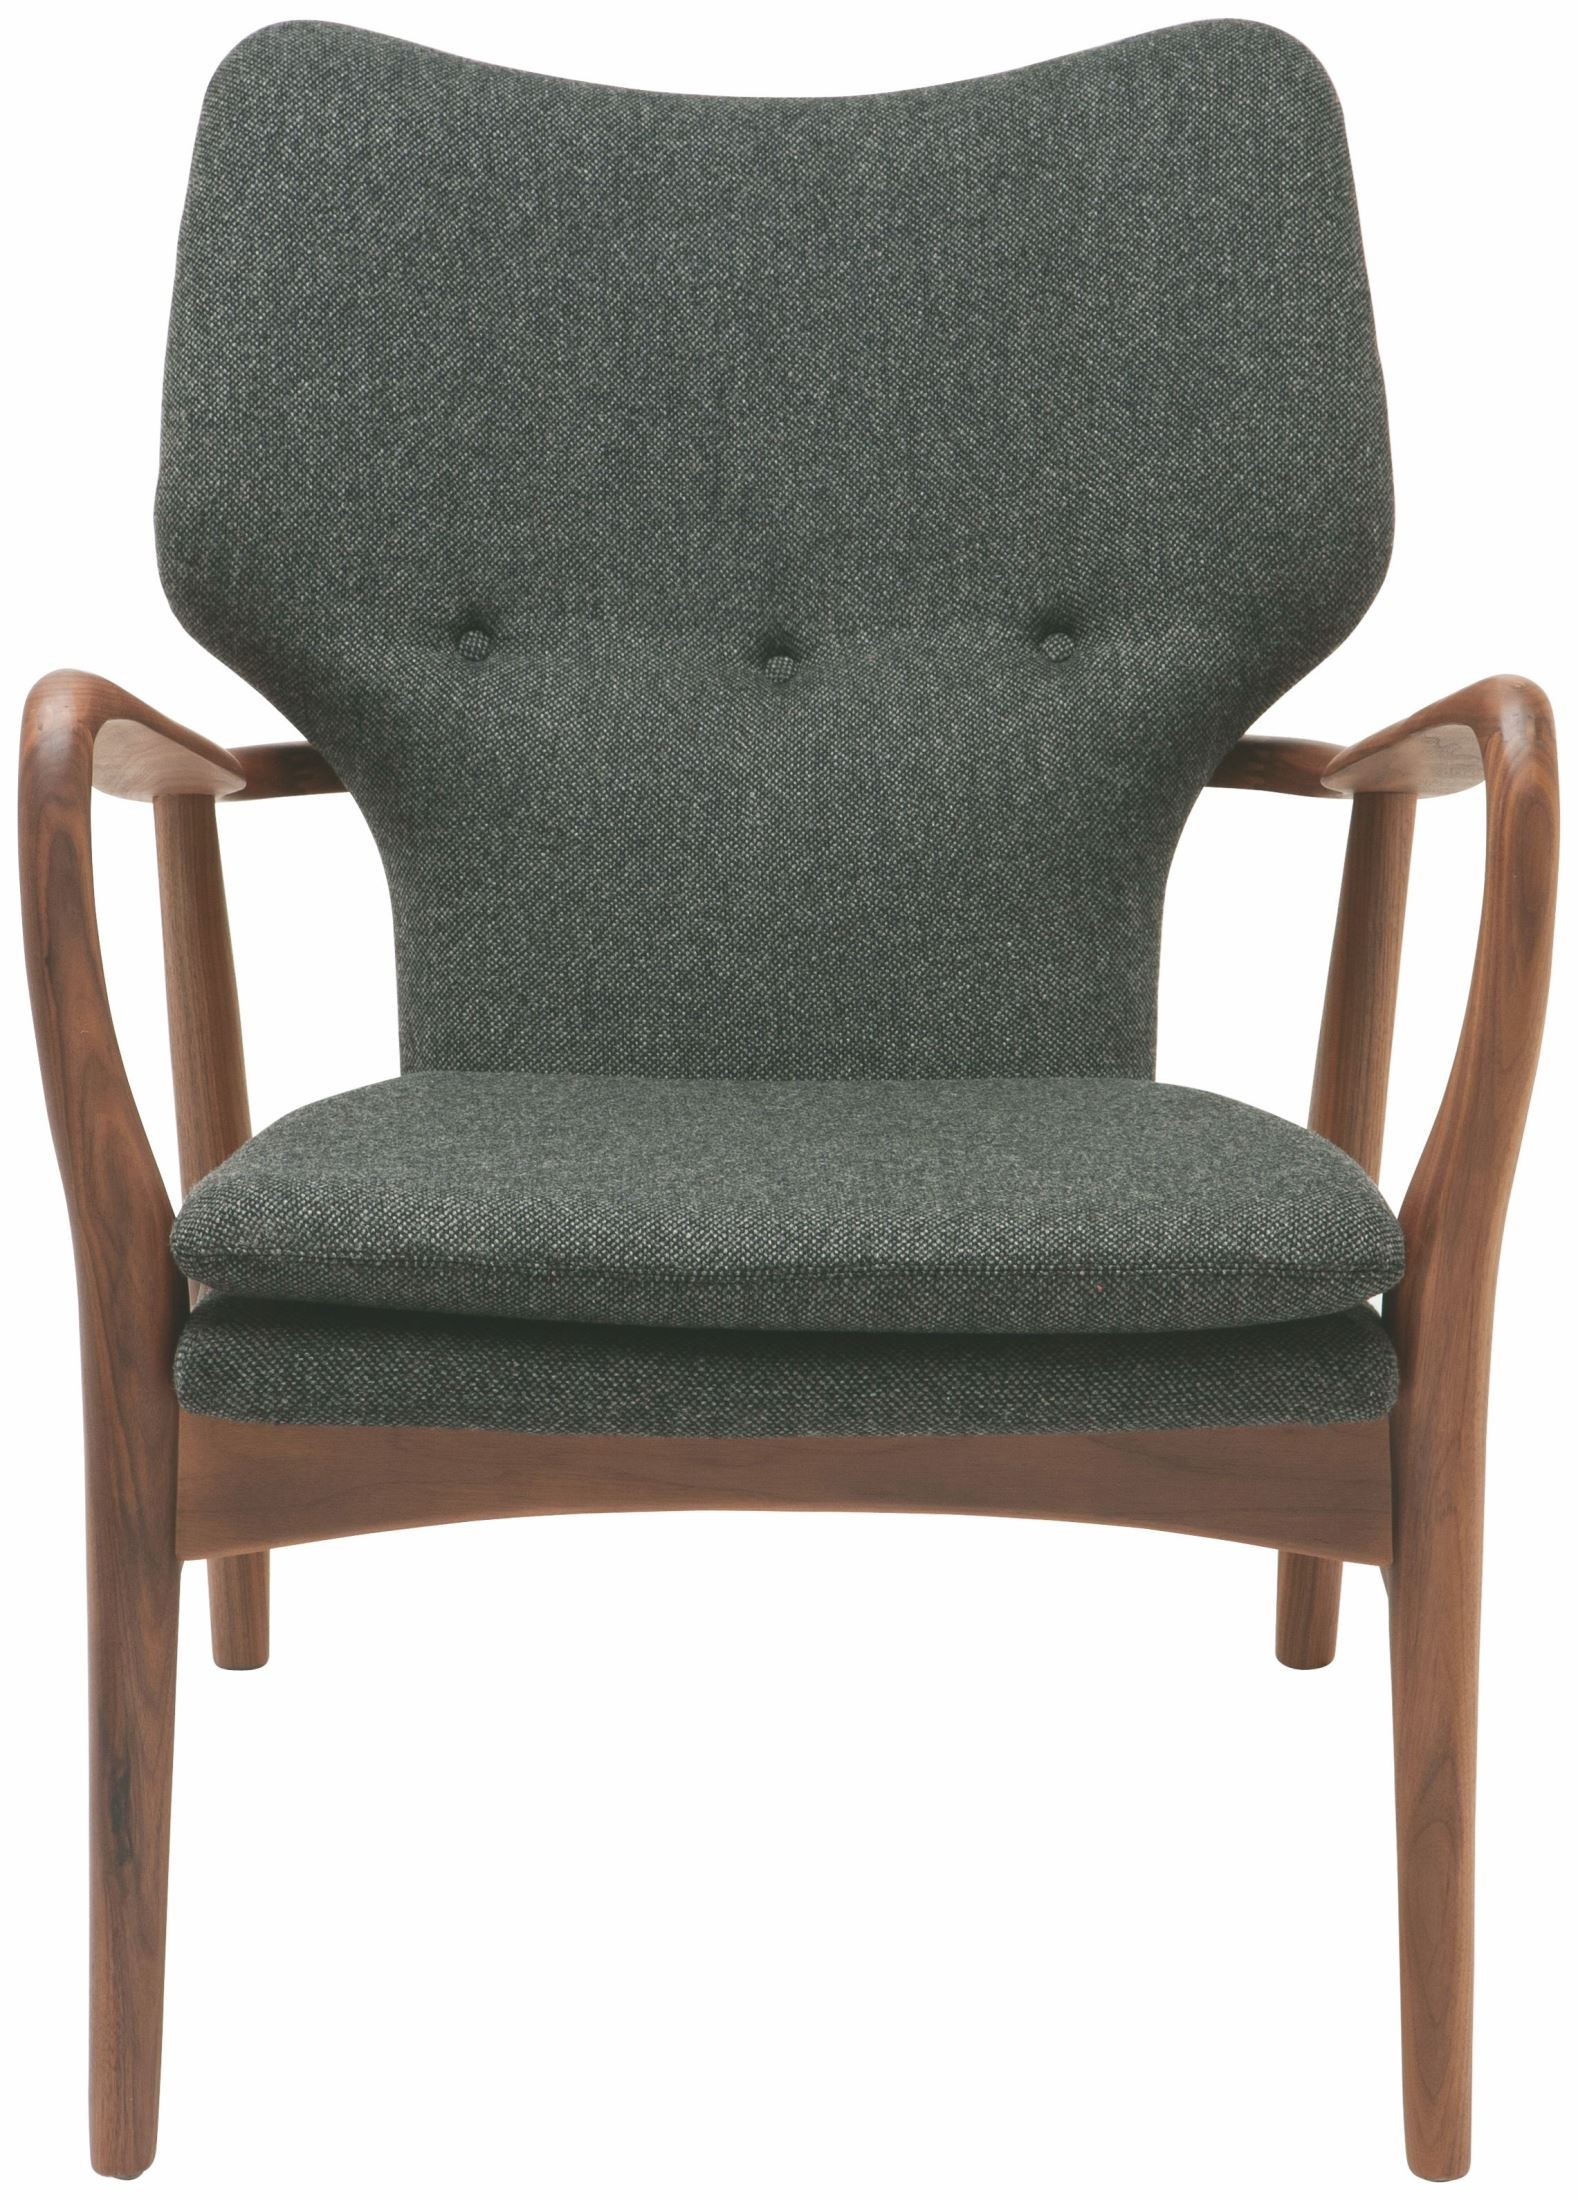 Patrik Medium Grey Fabric Occasional Chair HGEM483 Nuevo